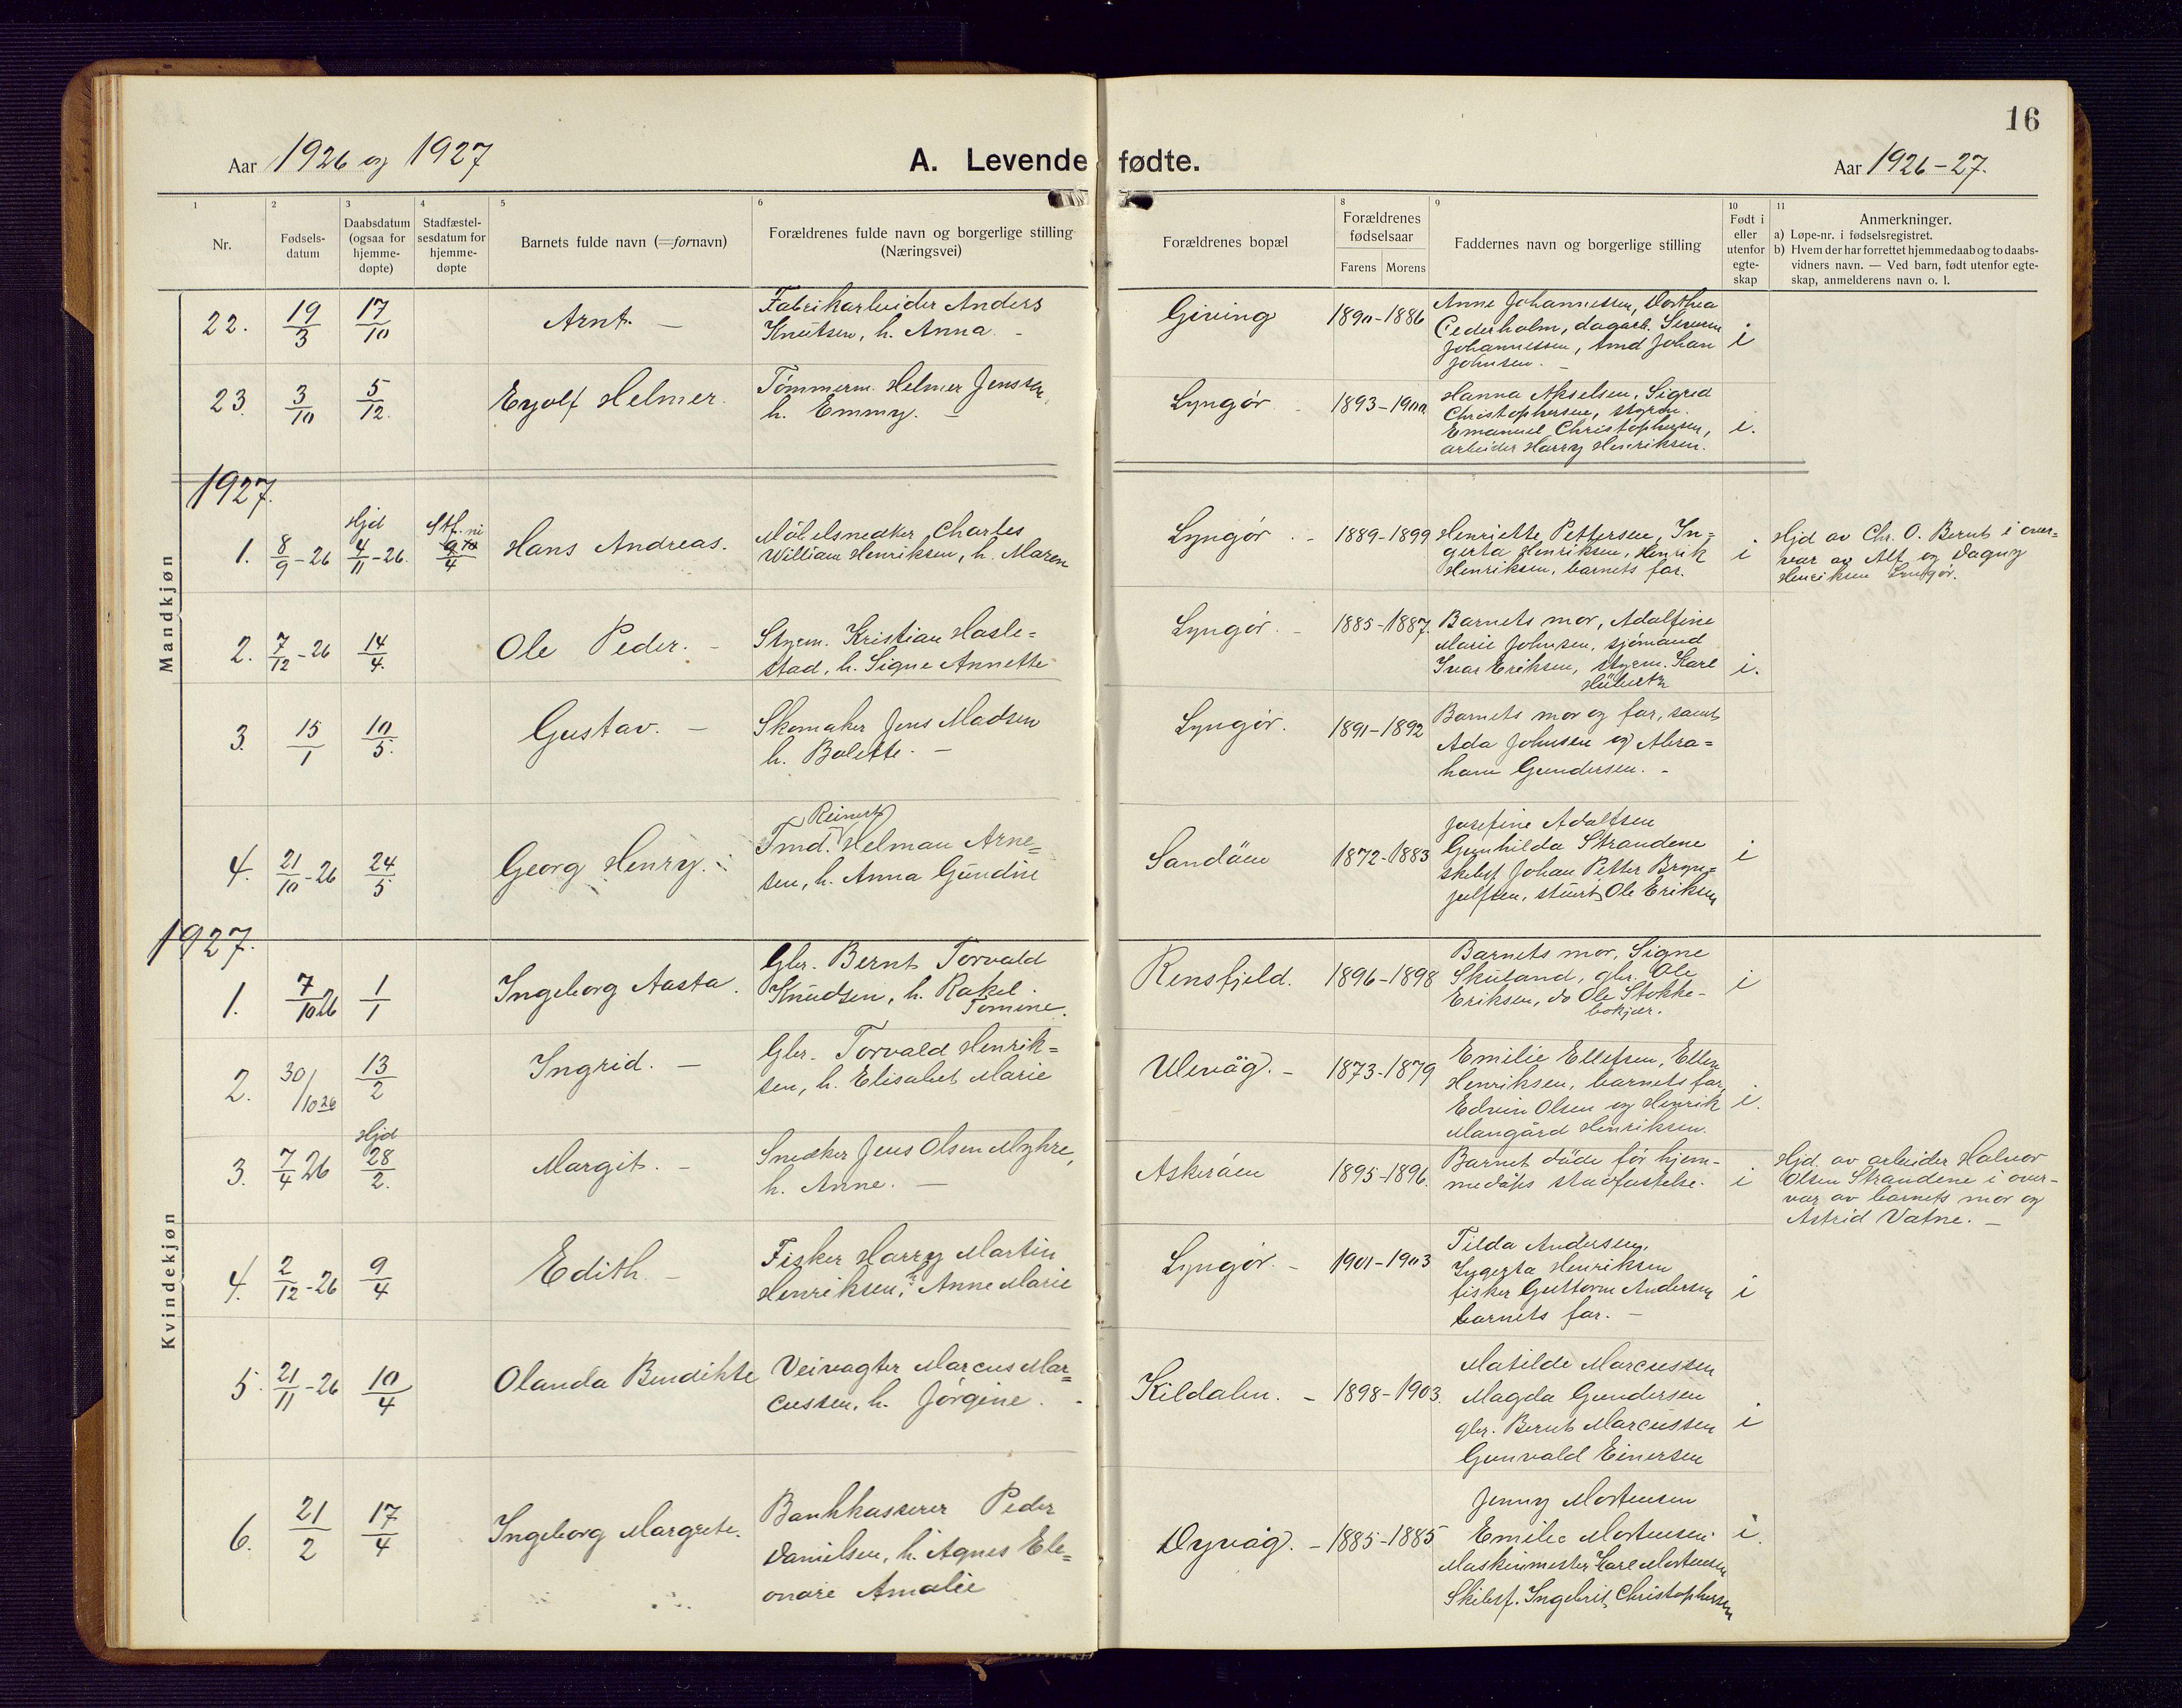 SAK, Dypvåg sokneprestkontor, F/Fb/Fba/L0015: Parish register (copy) no. B 15, 1922-1949, p. 16